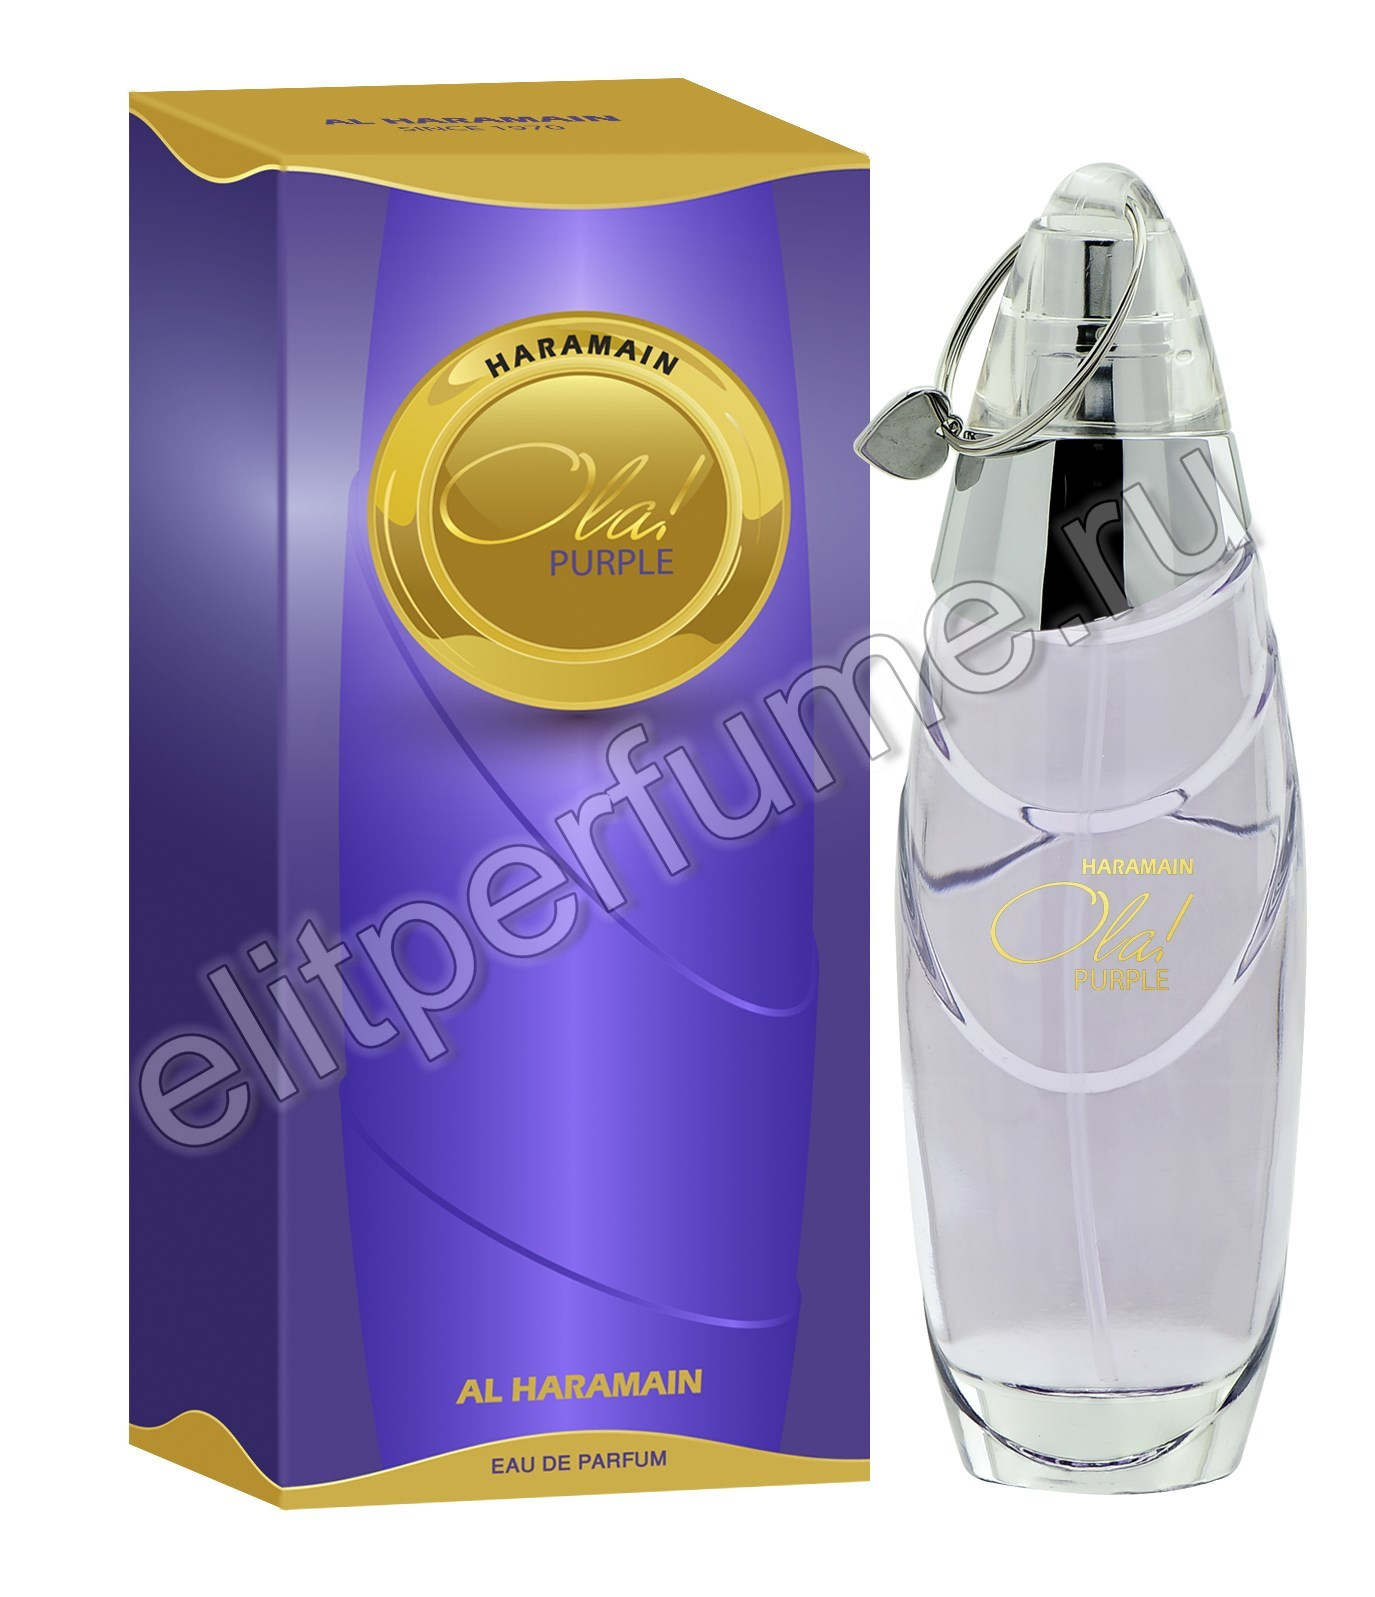 Haramain Ola Purple / Харамайн Ола Фиолетовый 100 мл спрей от Аль Харамайн Al Haramain Perfumes